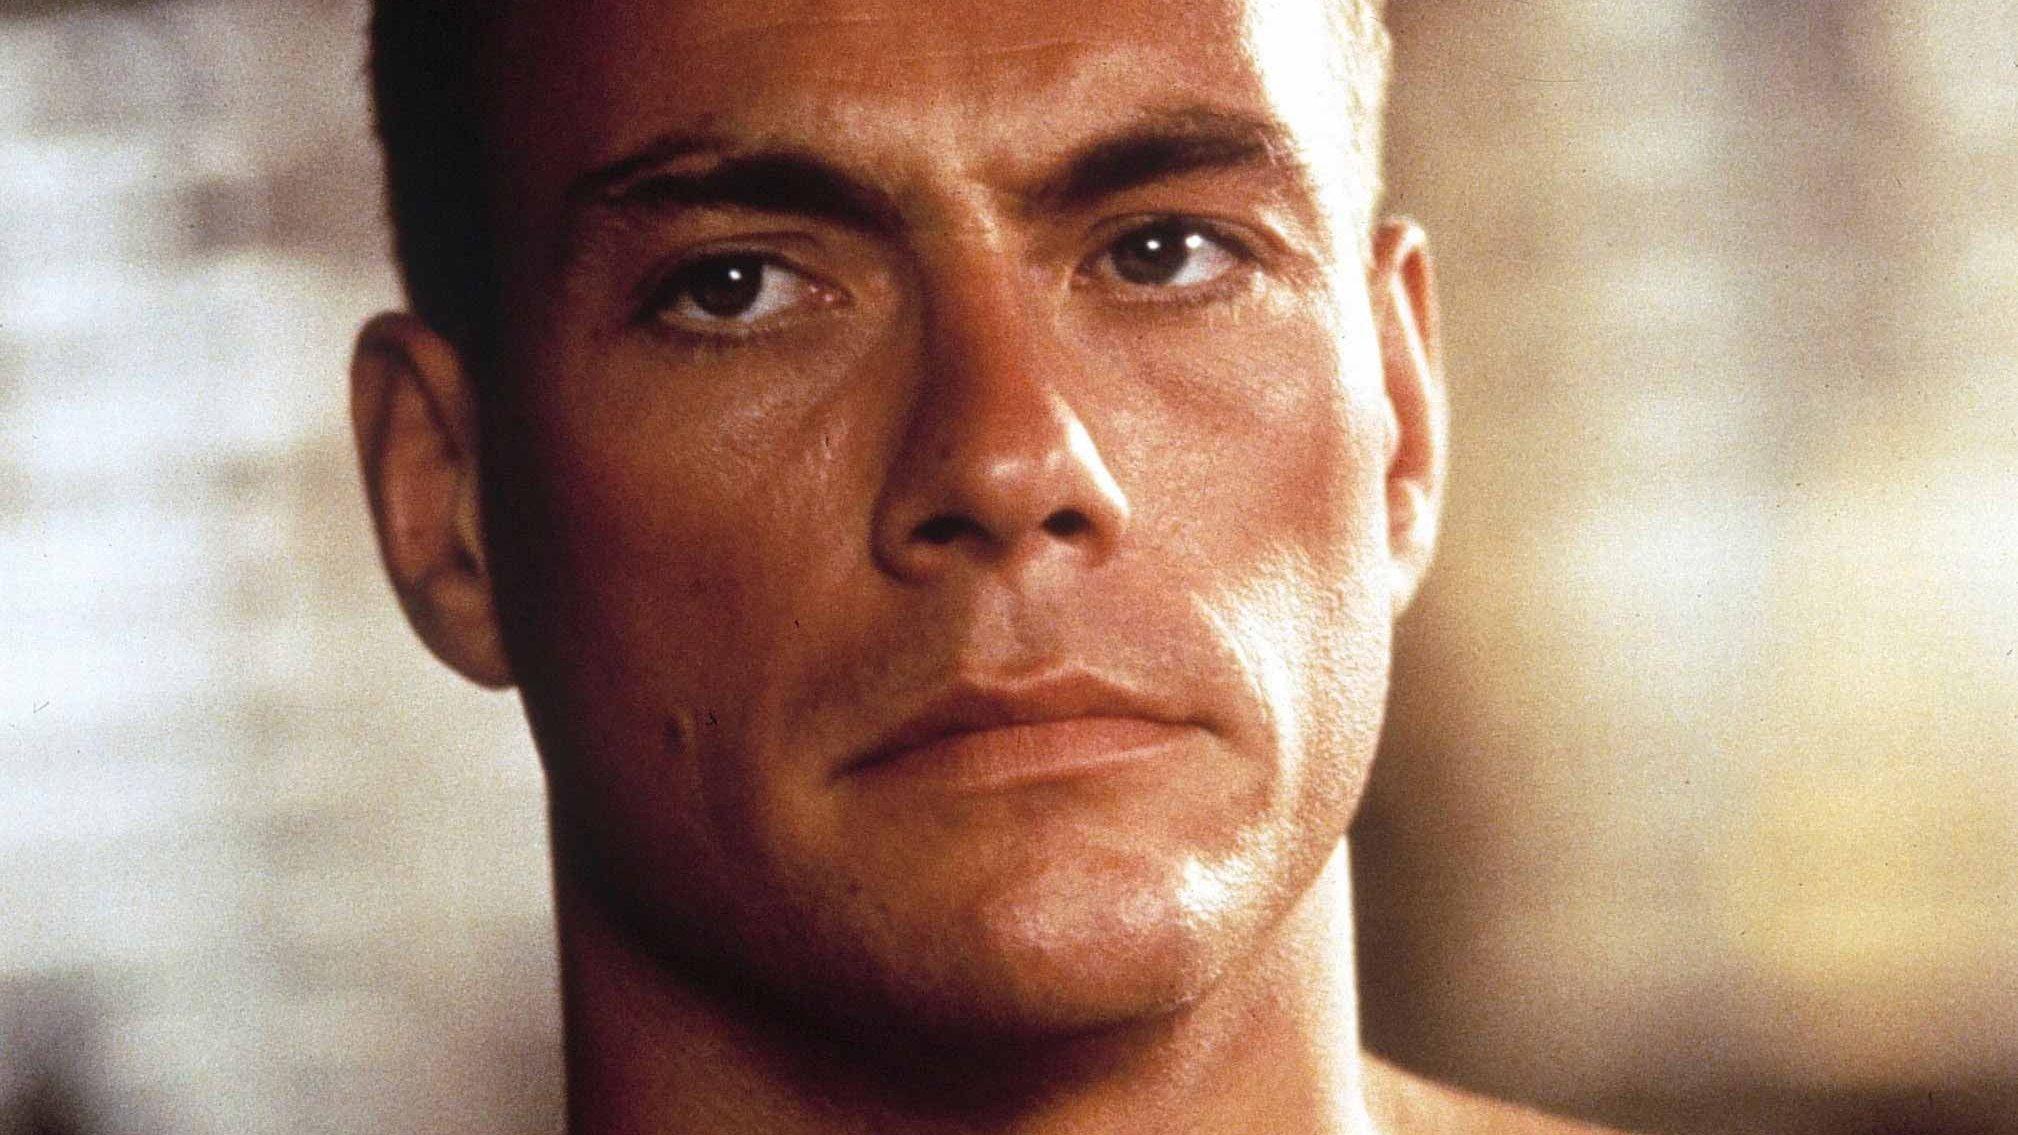 Jean-Claude Van Damme Has The #1 Movie On Netflix